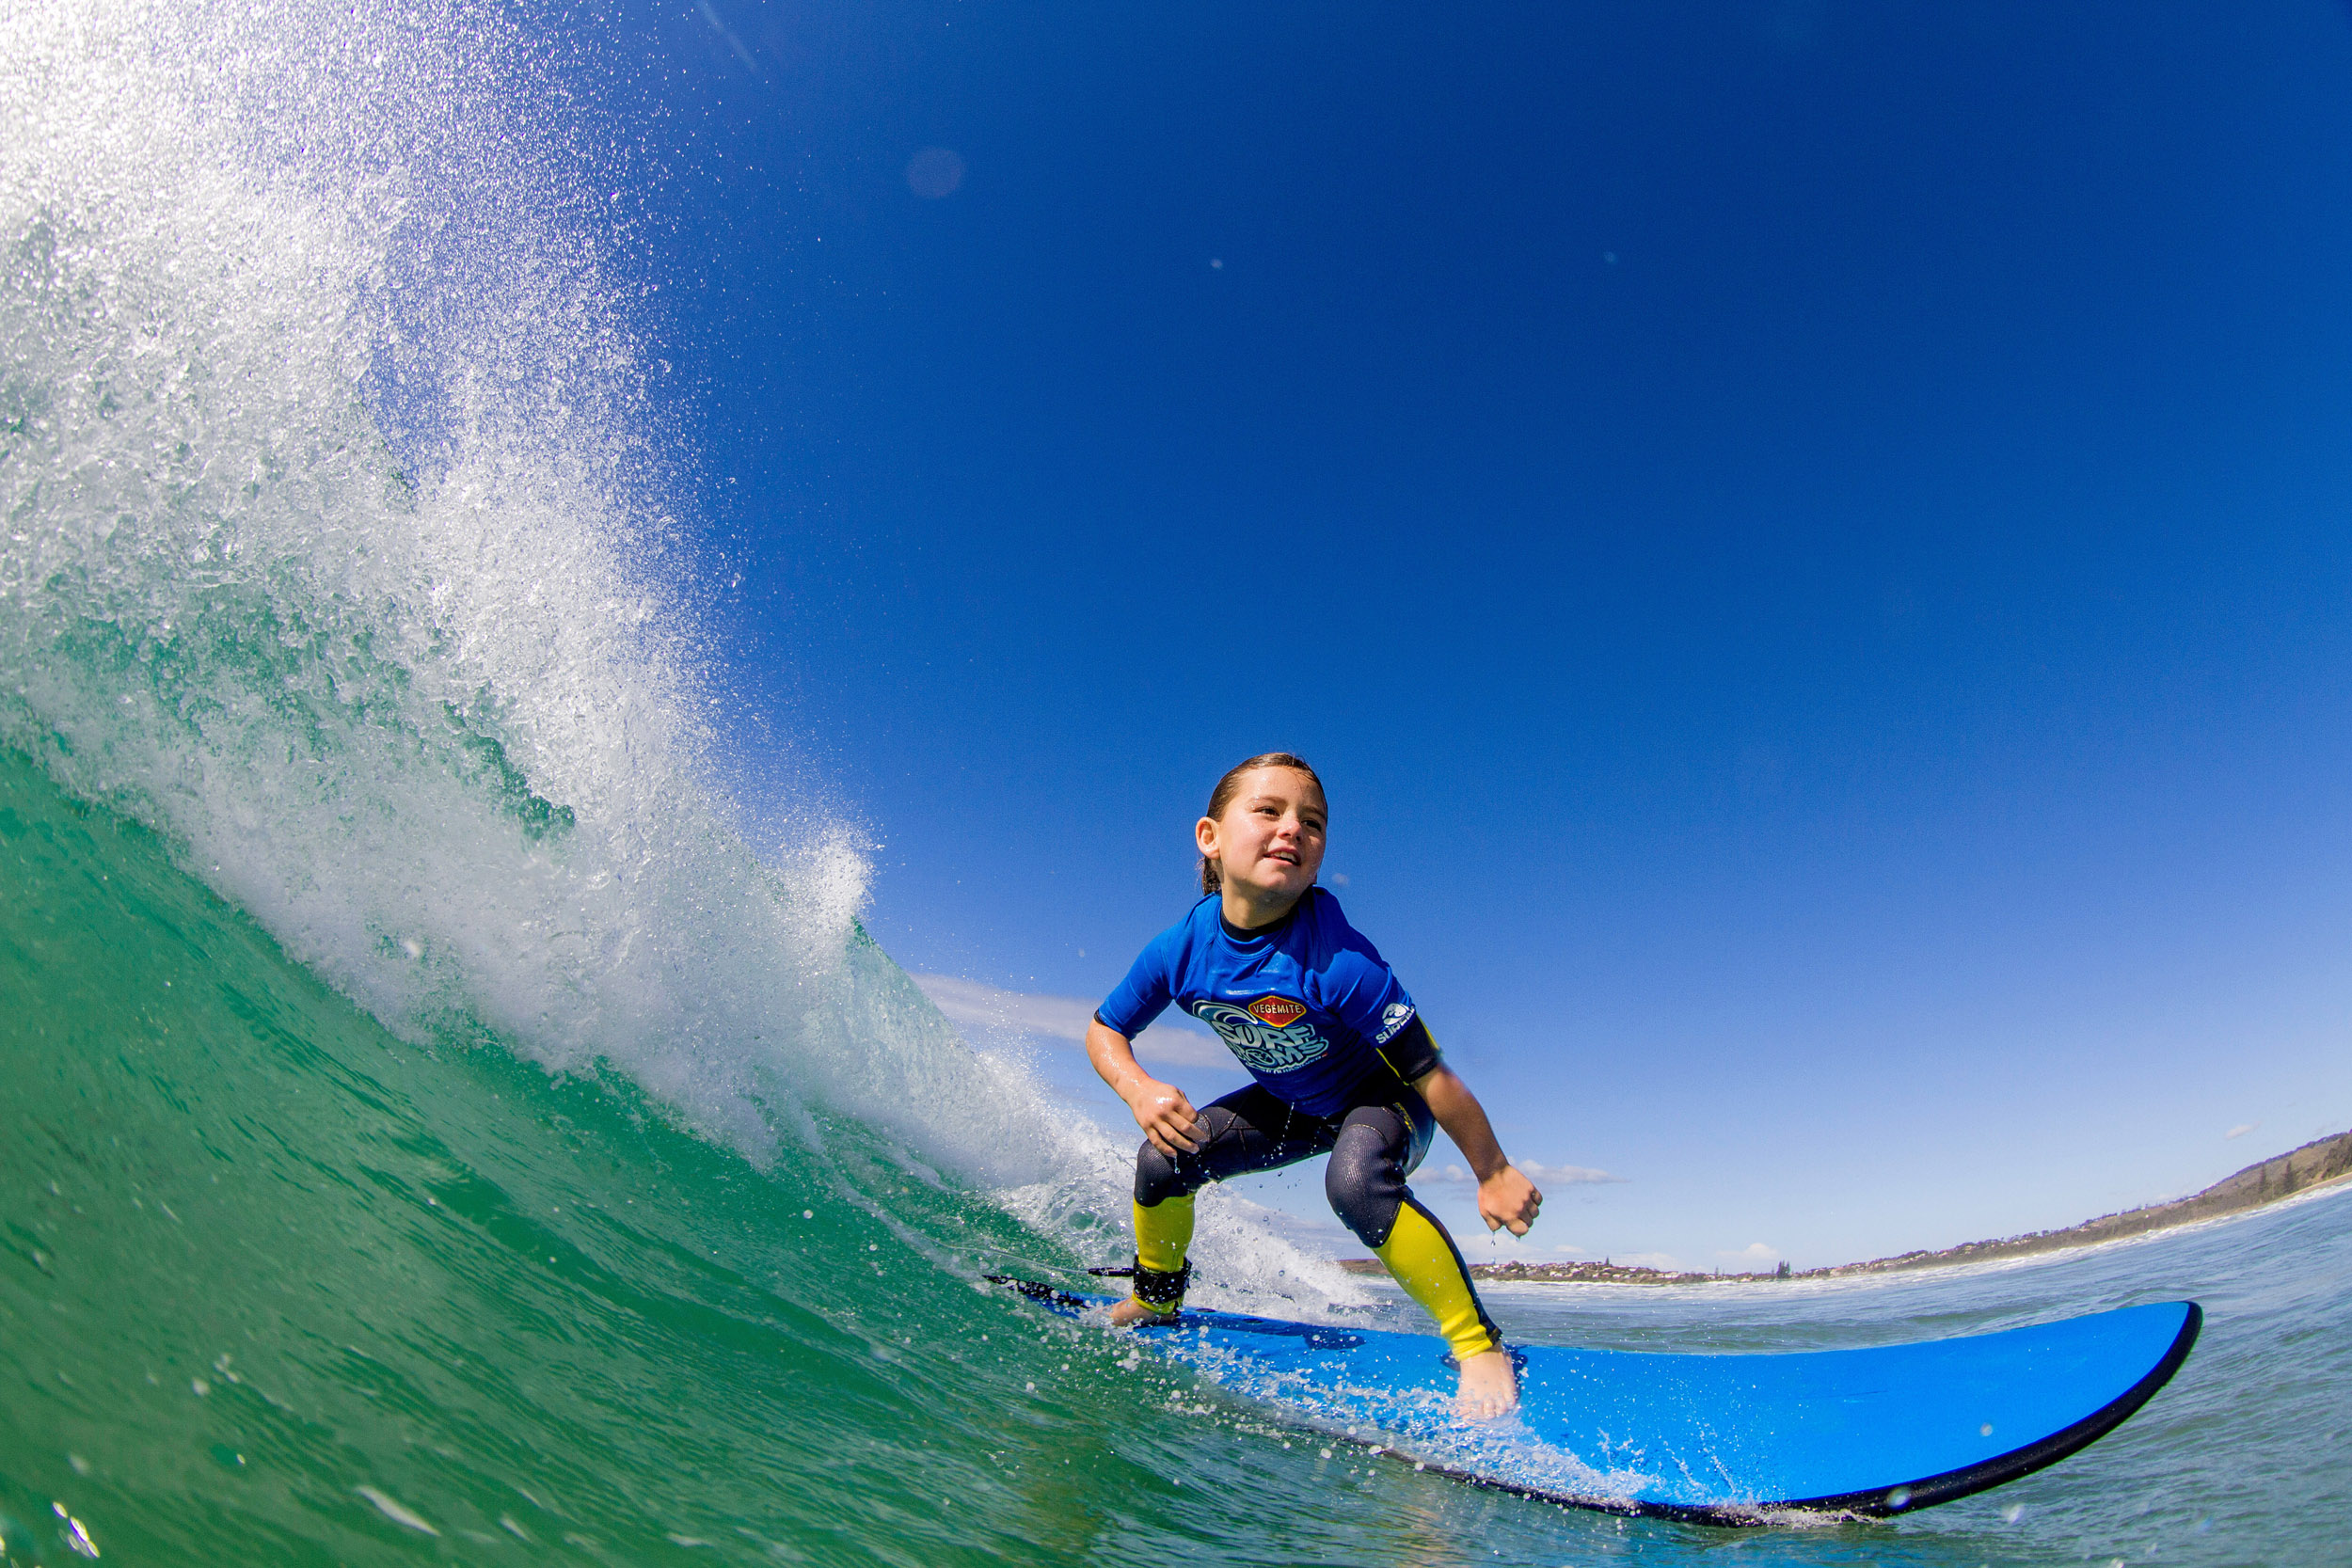 surfing-australia-surf-groms-photography-JSG-296.jpg